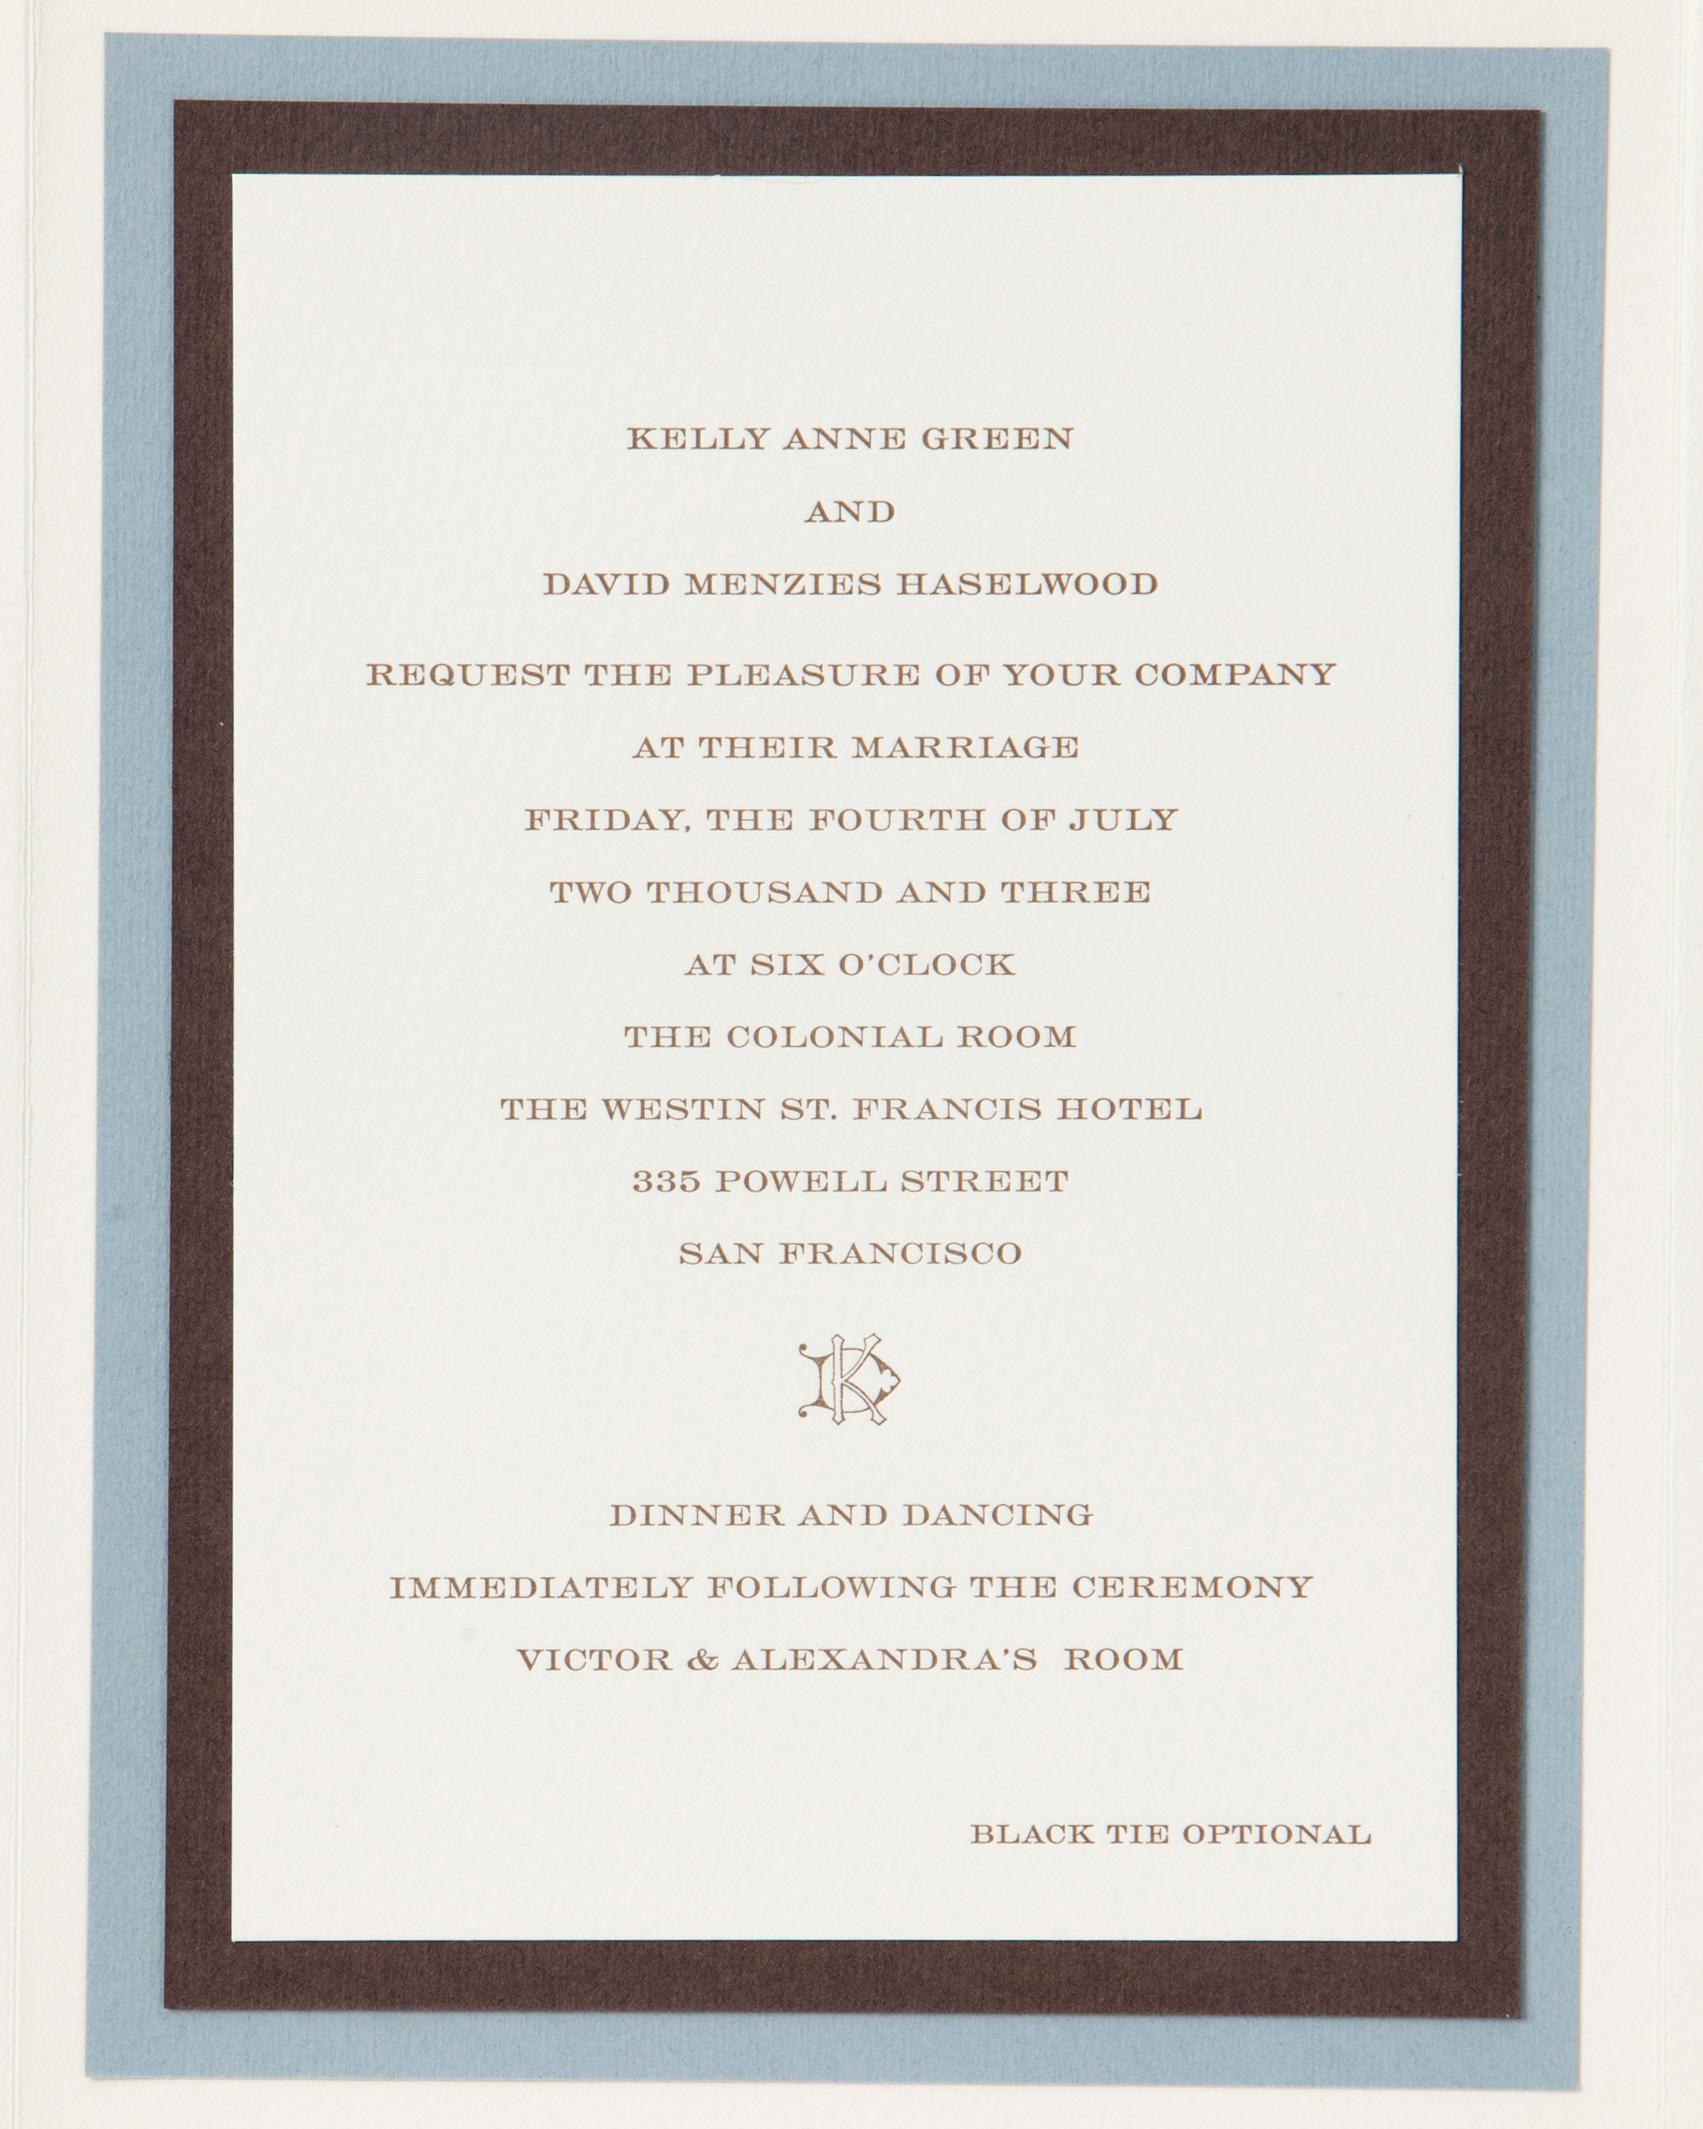 host-lines-weddings-stationery-10-couple-0607-d111607-1014.jpg